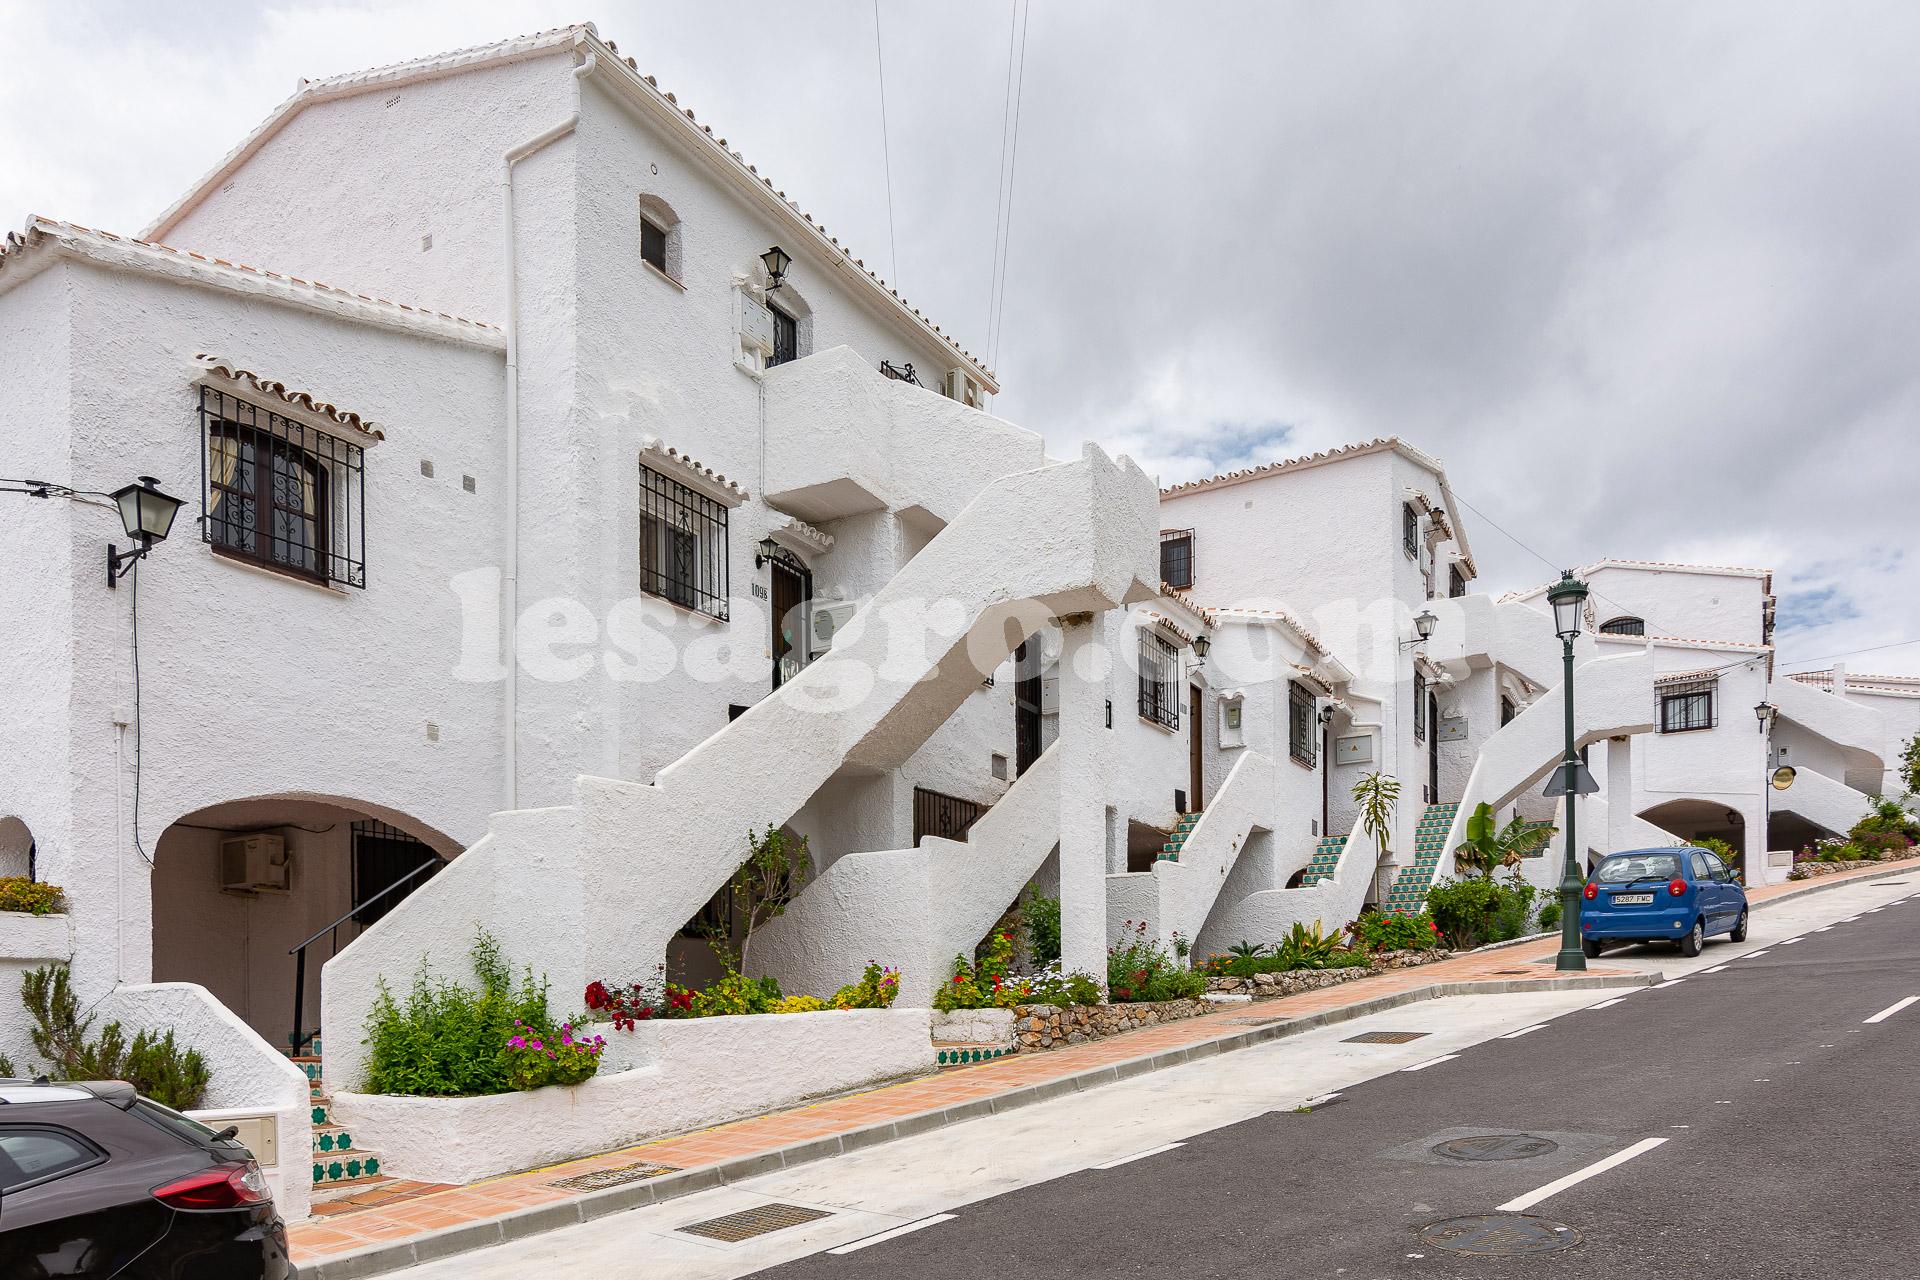 Capistrano Pueblo -For Sale Nerja